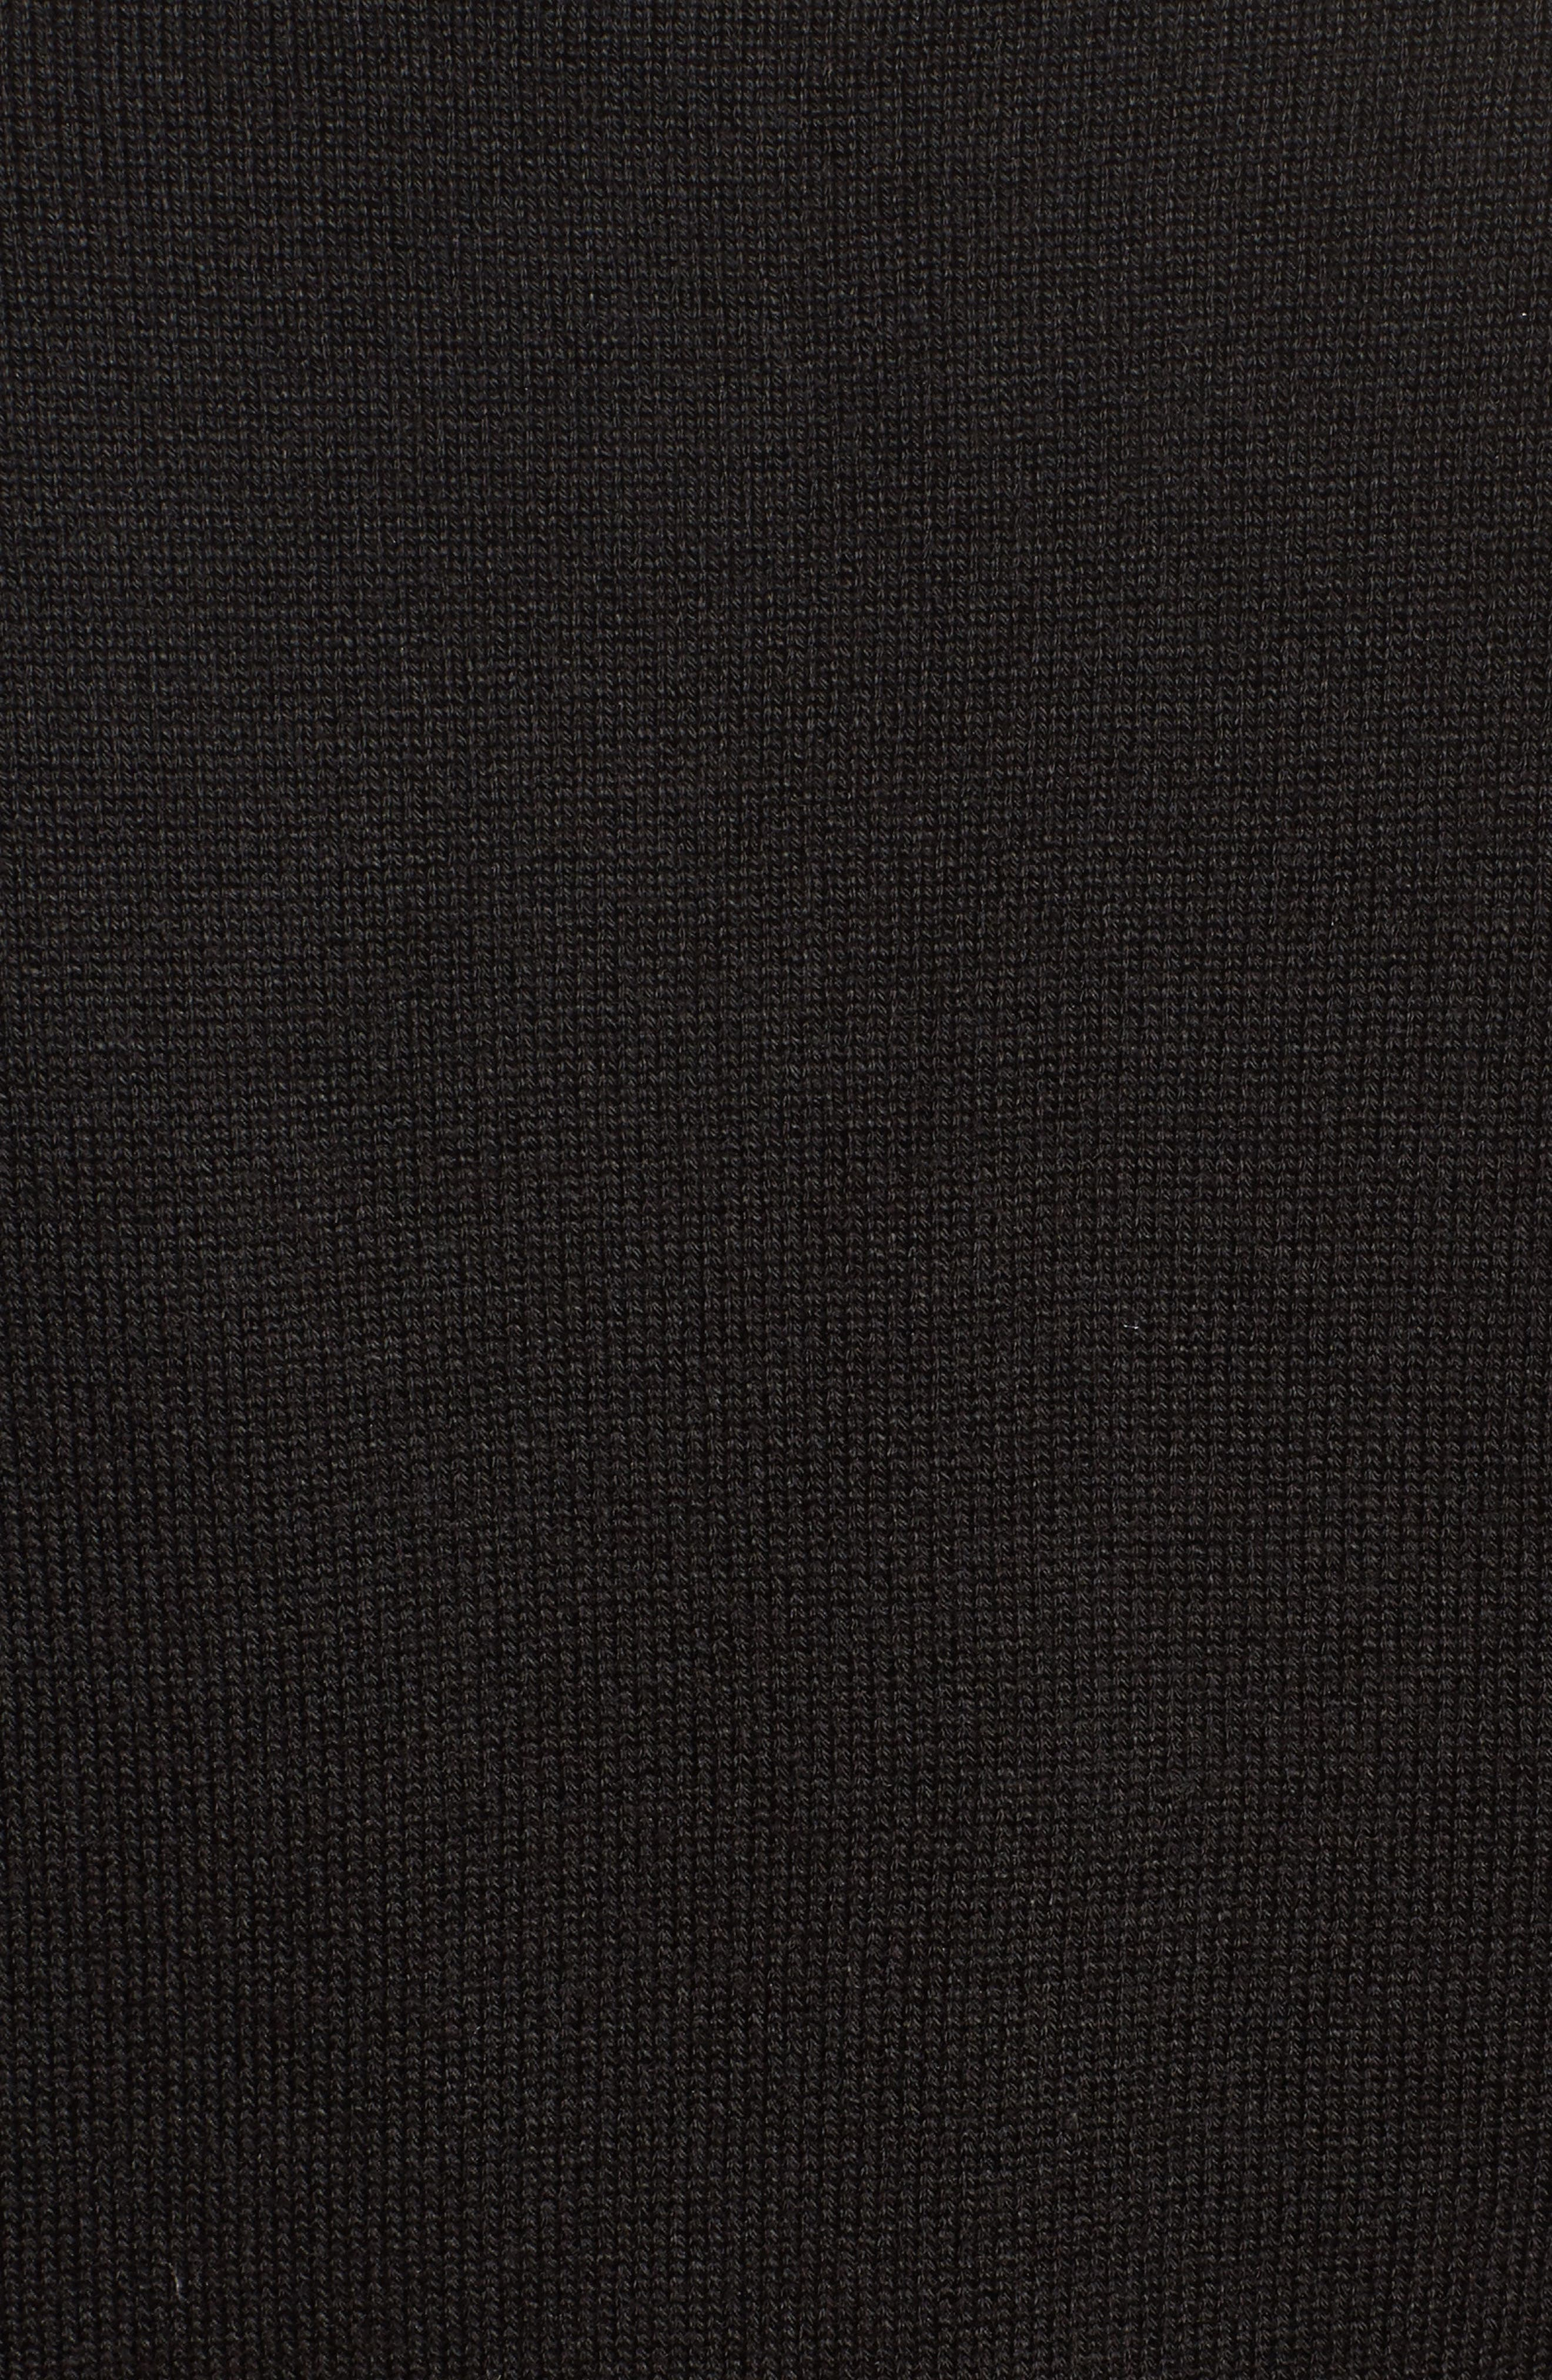 Bell Sleeve Bolero,                             Alternate thumbnail 5, color,                             BLACK